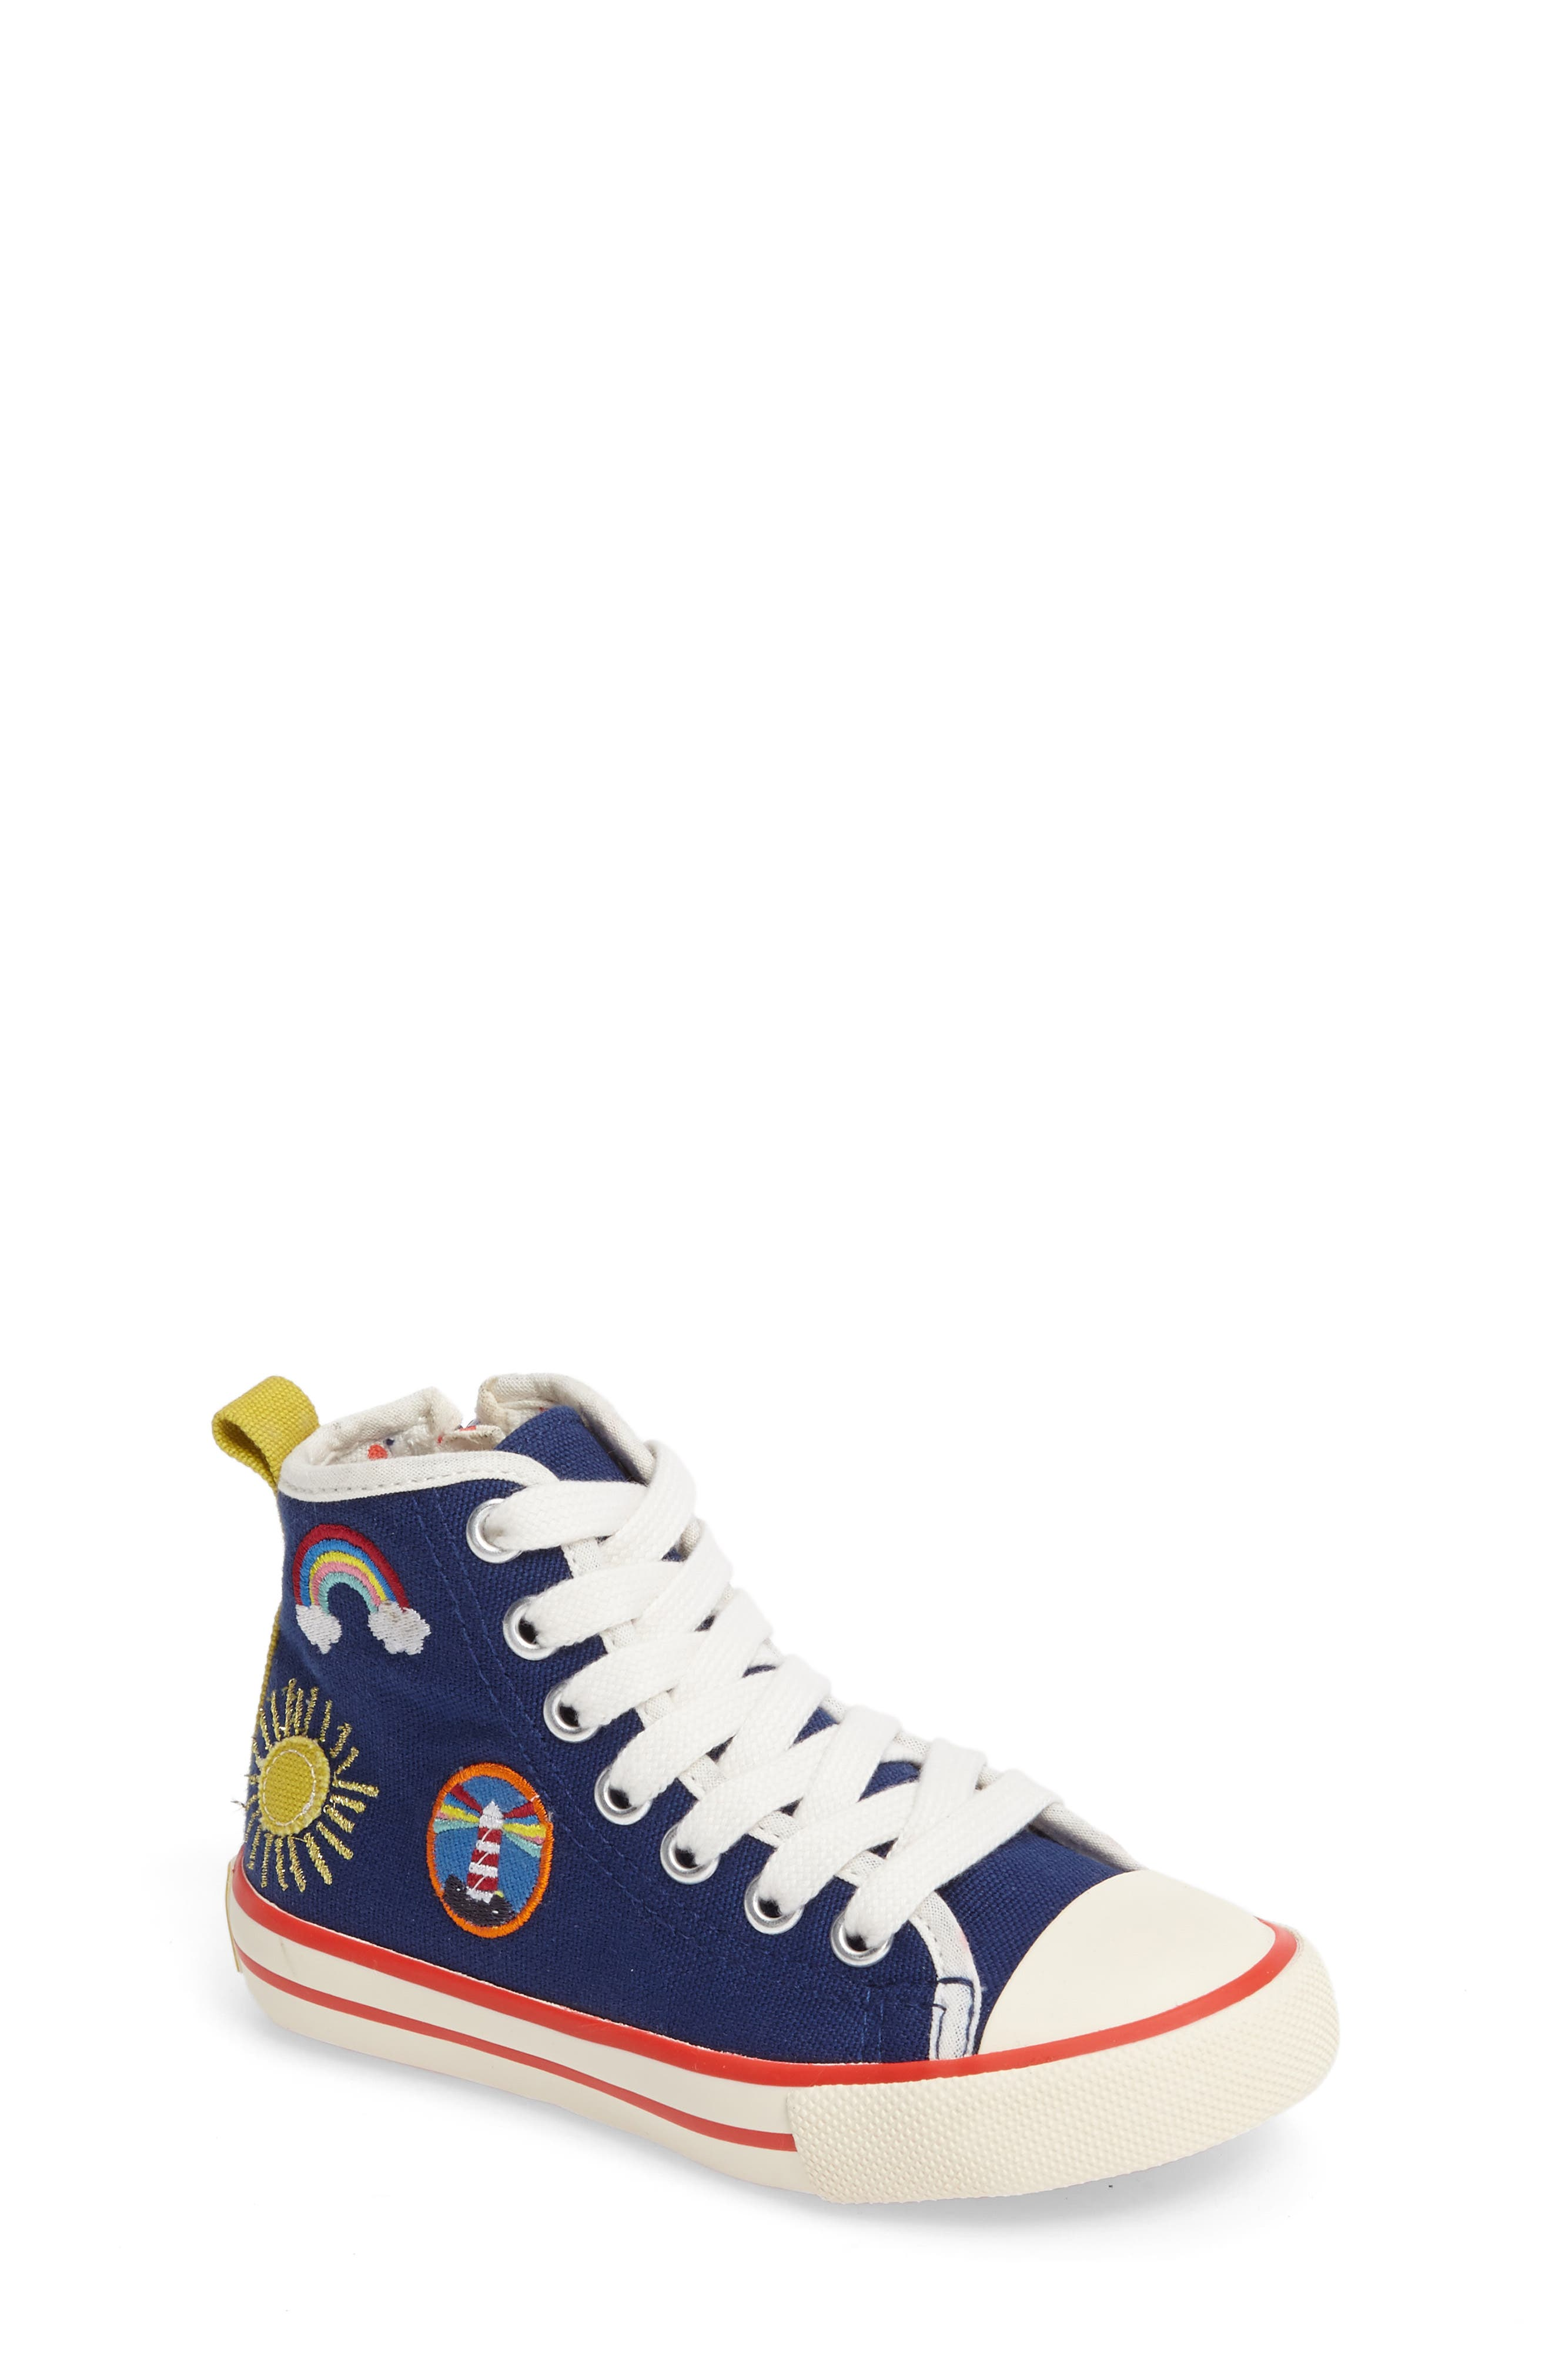 Mini Boden Appliqué High Top Sneaker (Toddler, Little Kid & Big Kid)